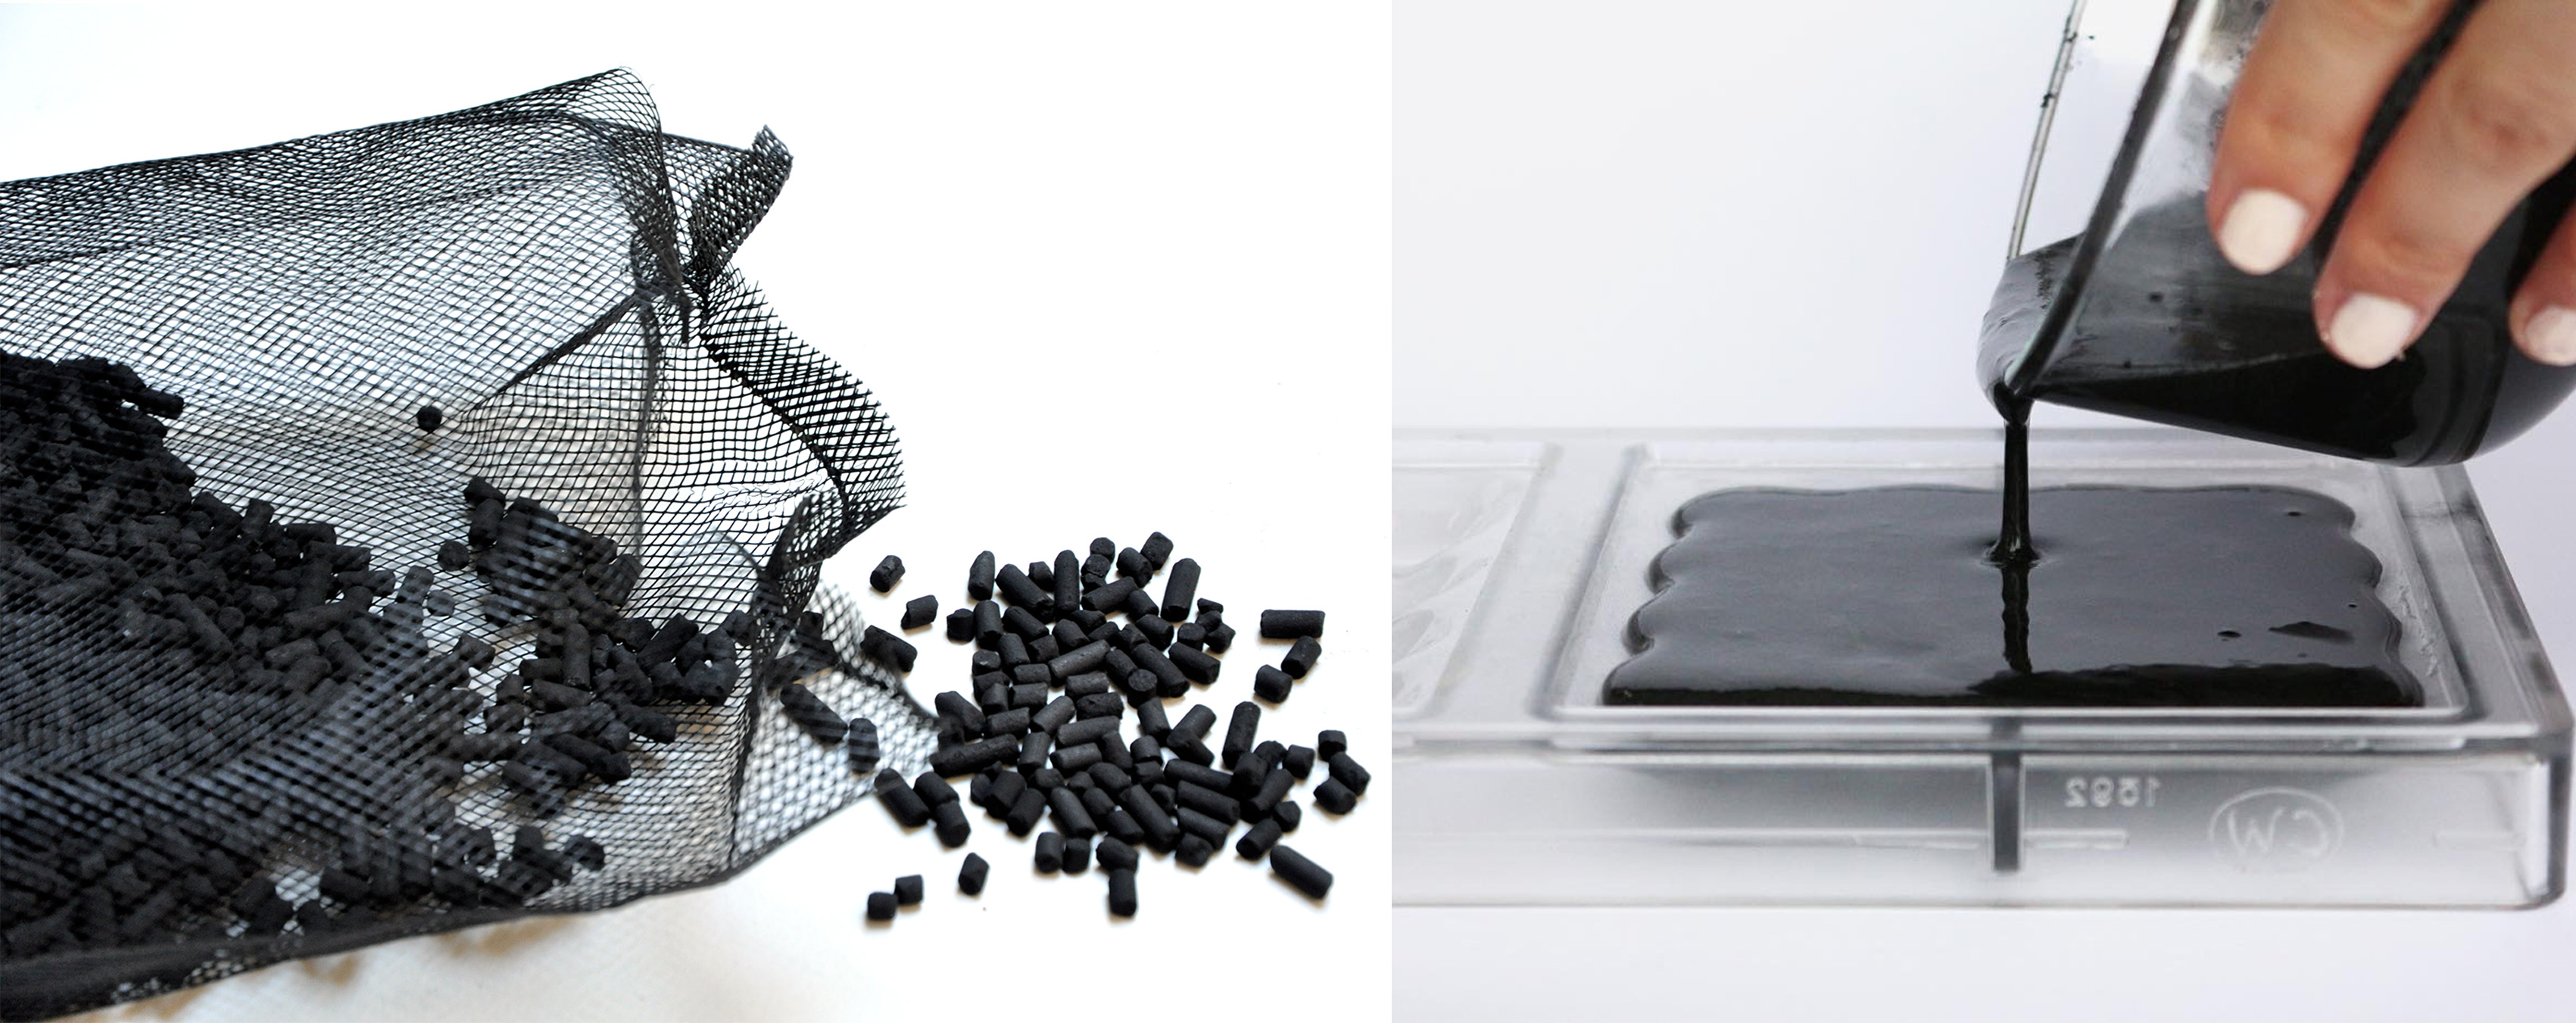 Bio Filter : bioplastic + activated charcoal | FabTextiles